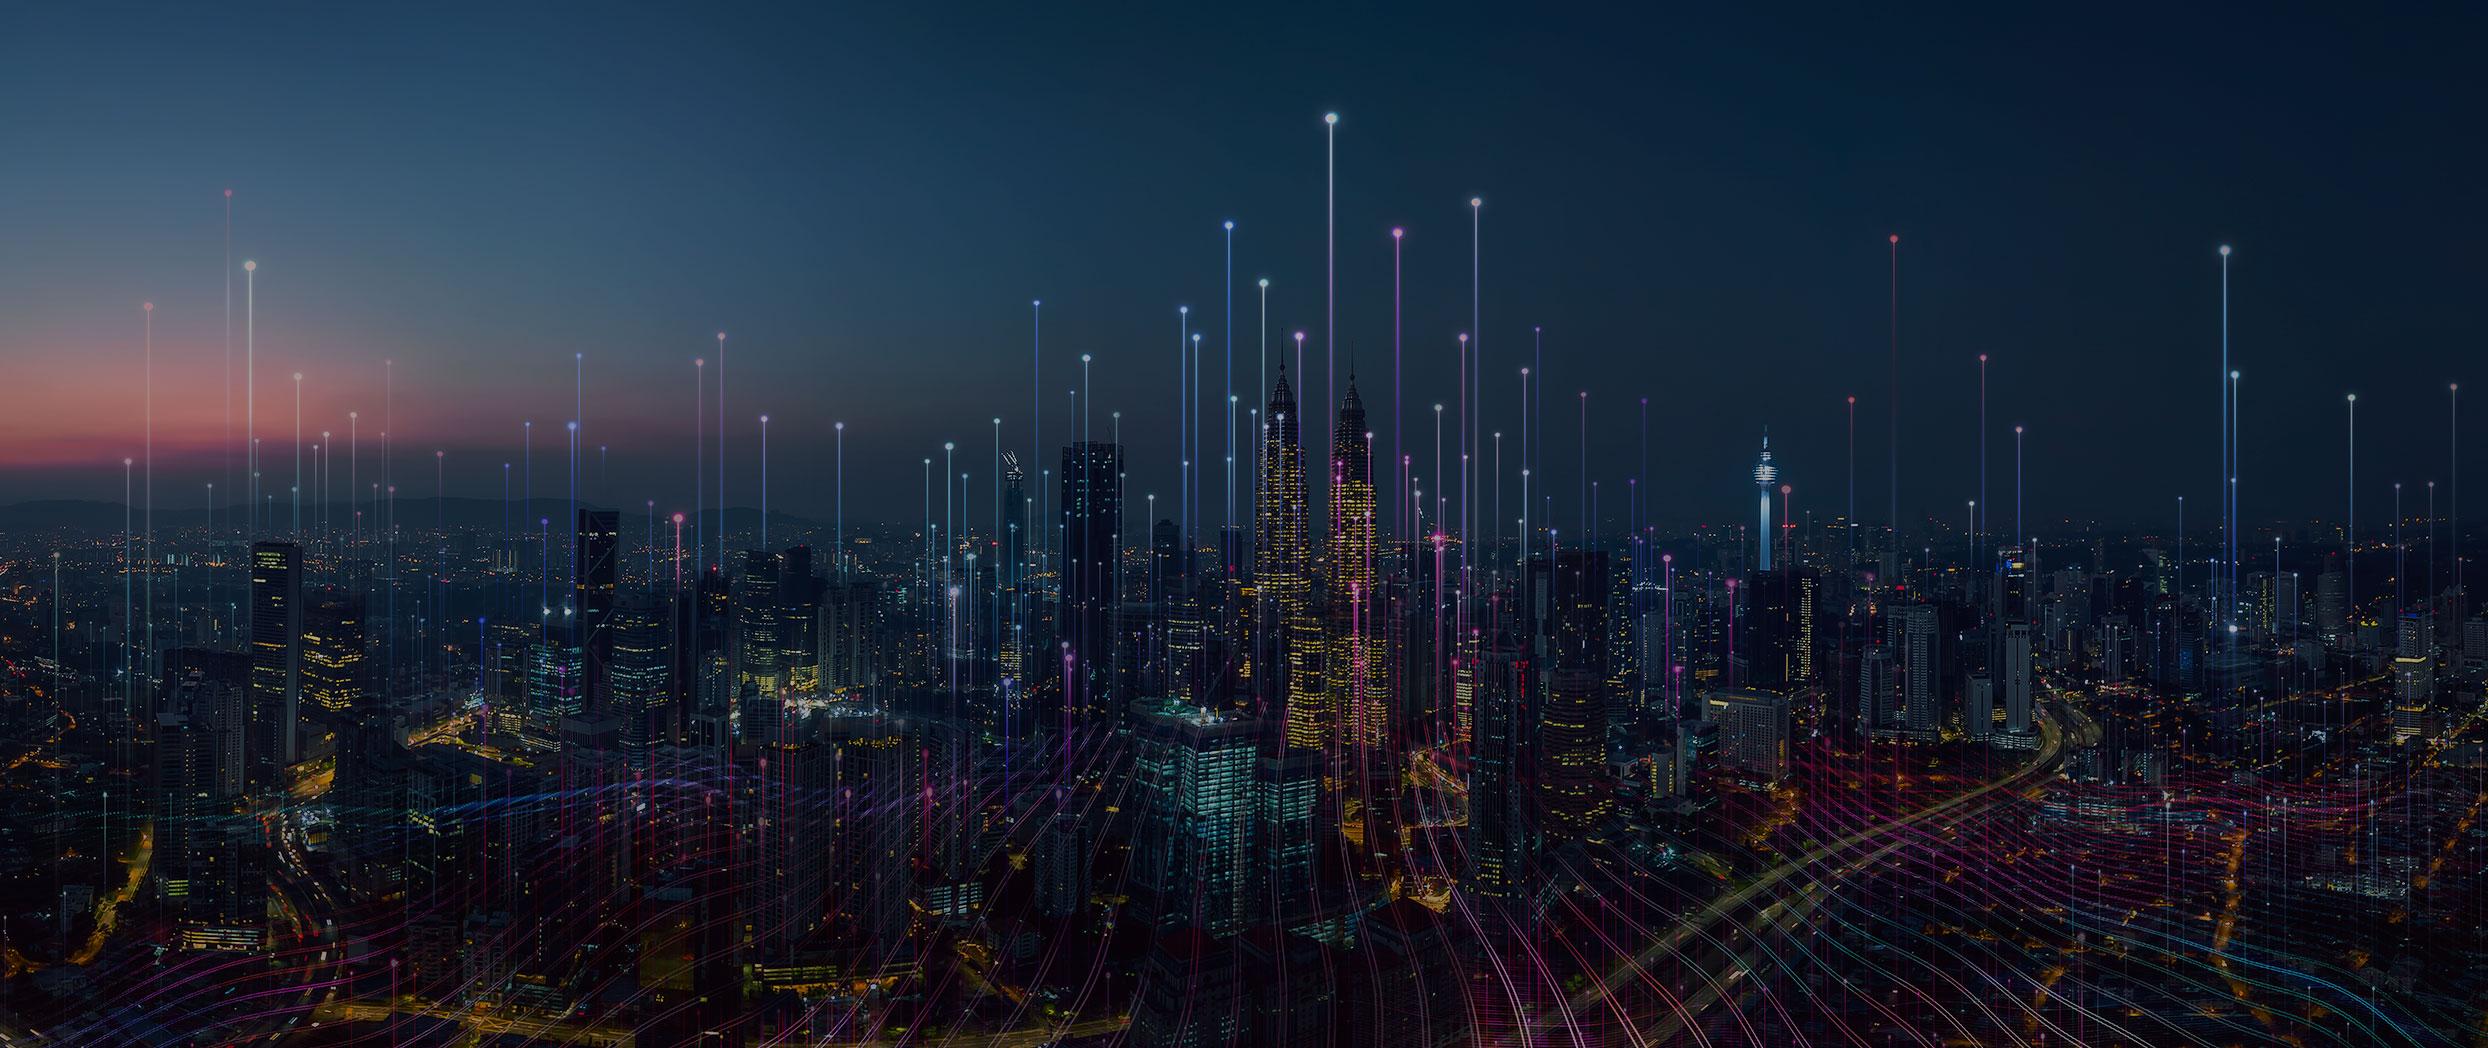 Machine Learning, pilar de la IA en Ciberseguridad